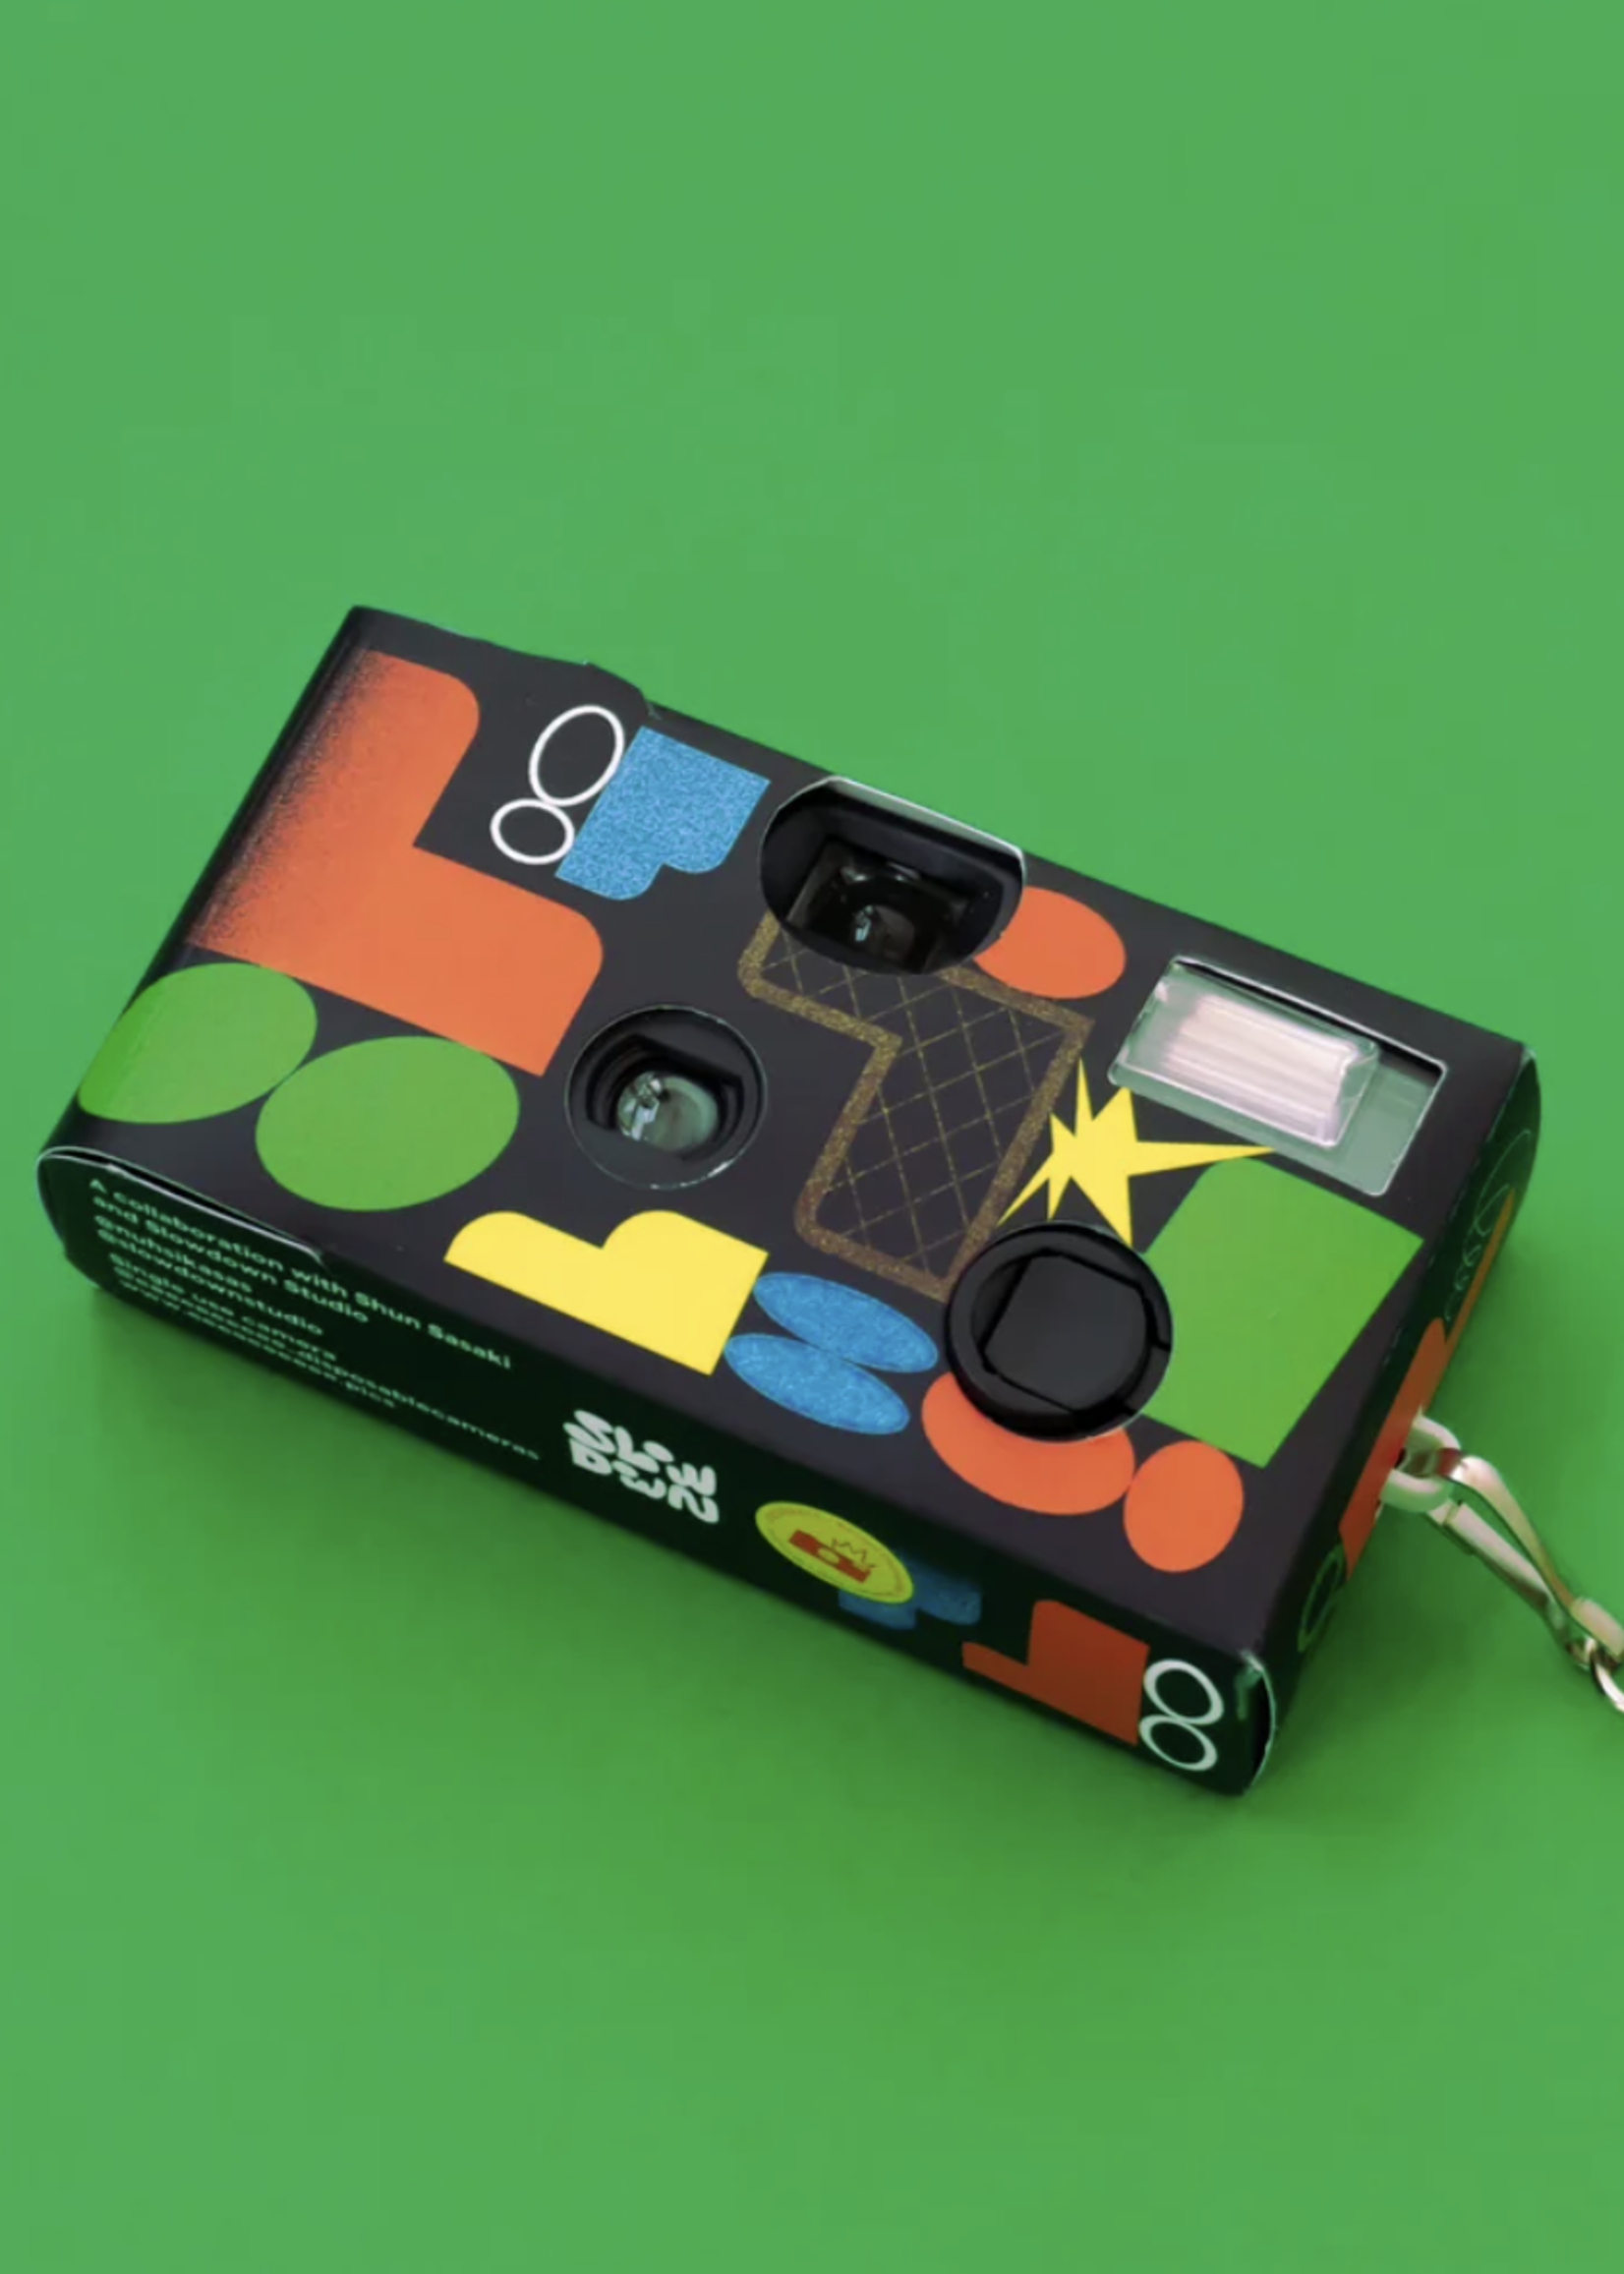 EEEEEEEEEE Caméras Jetable Recyclés